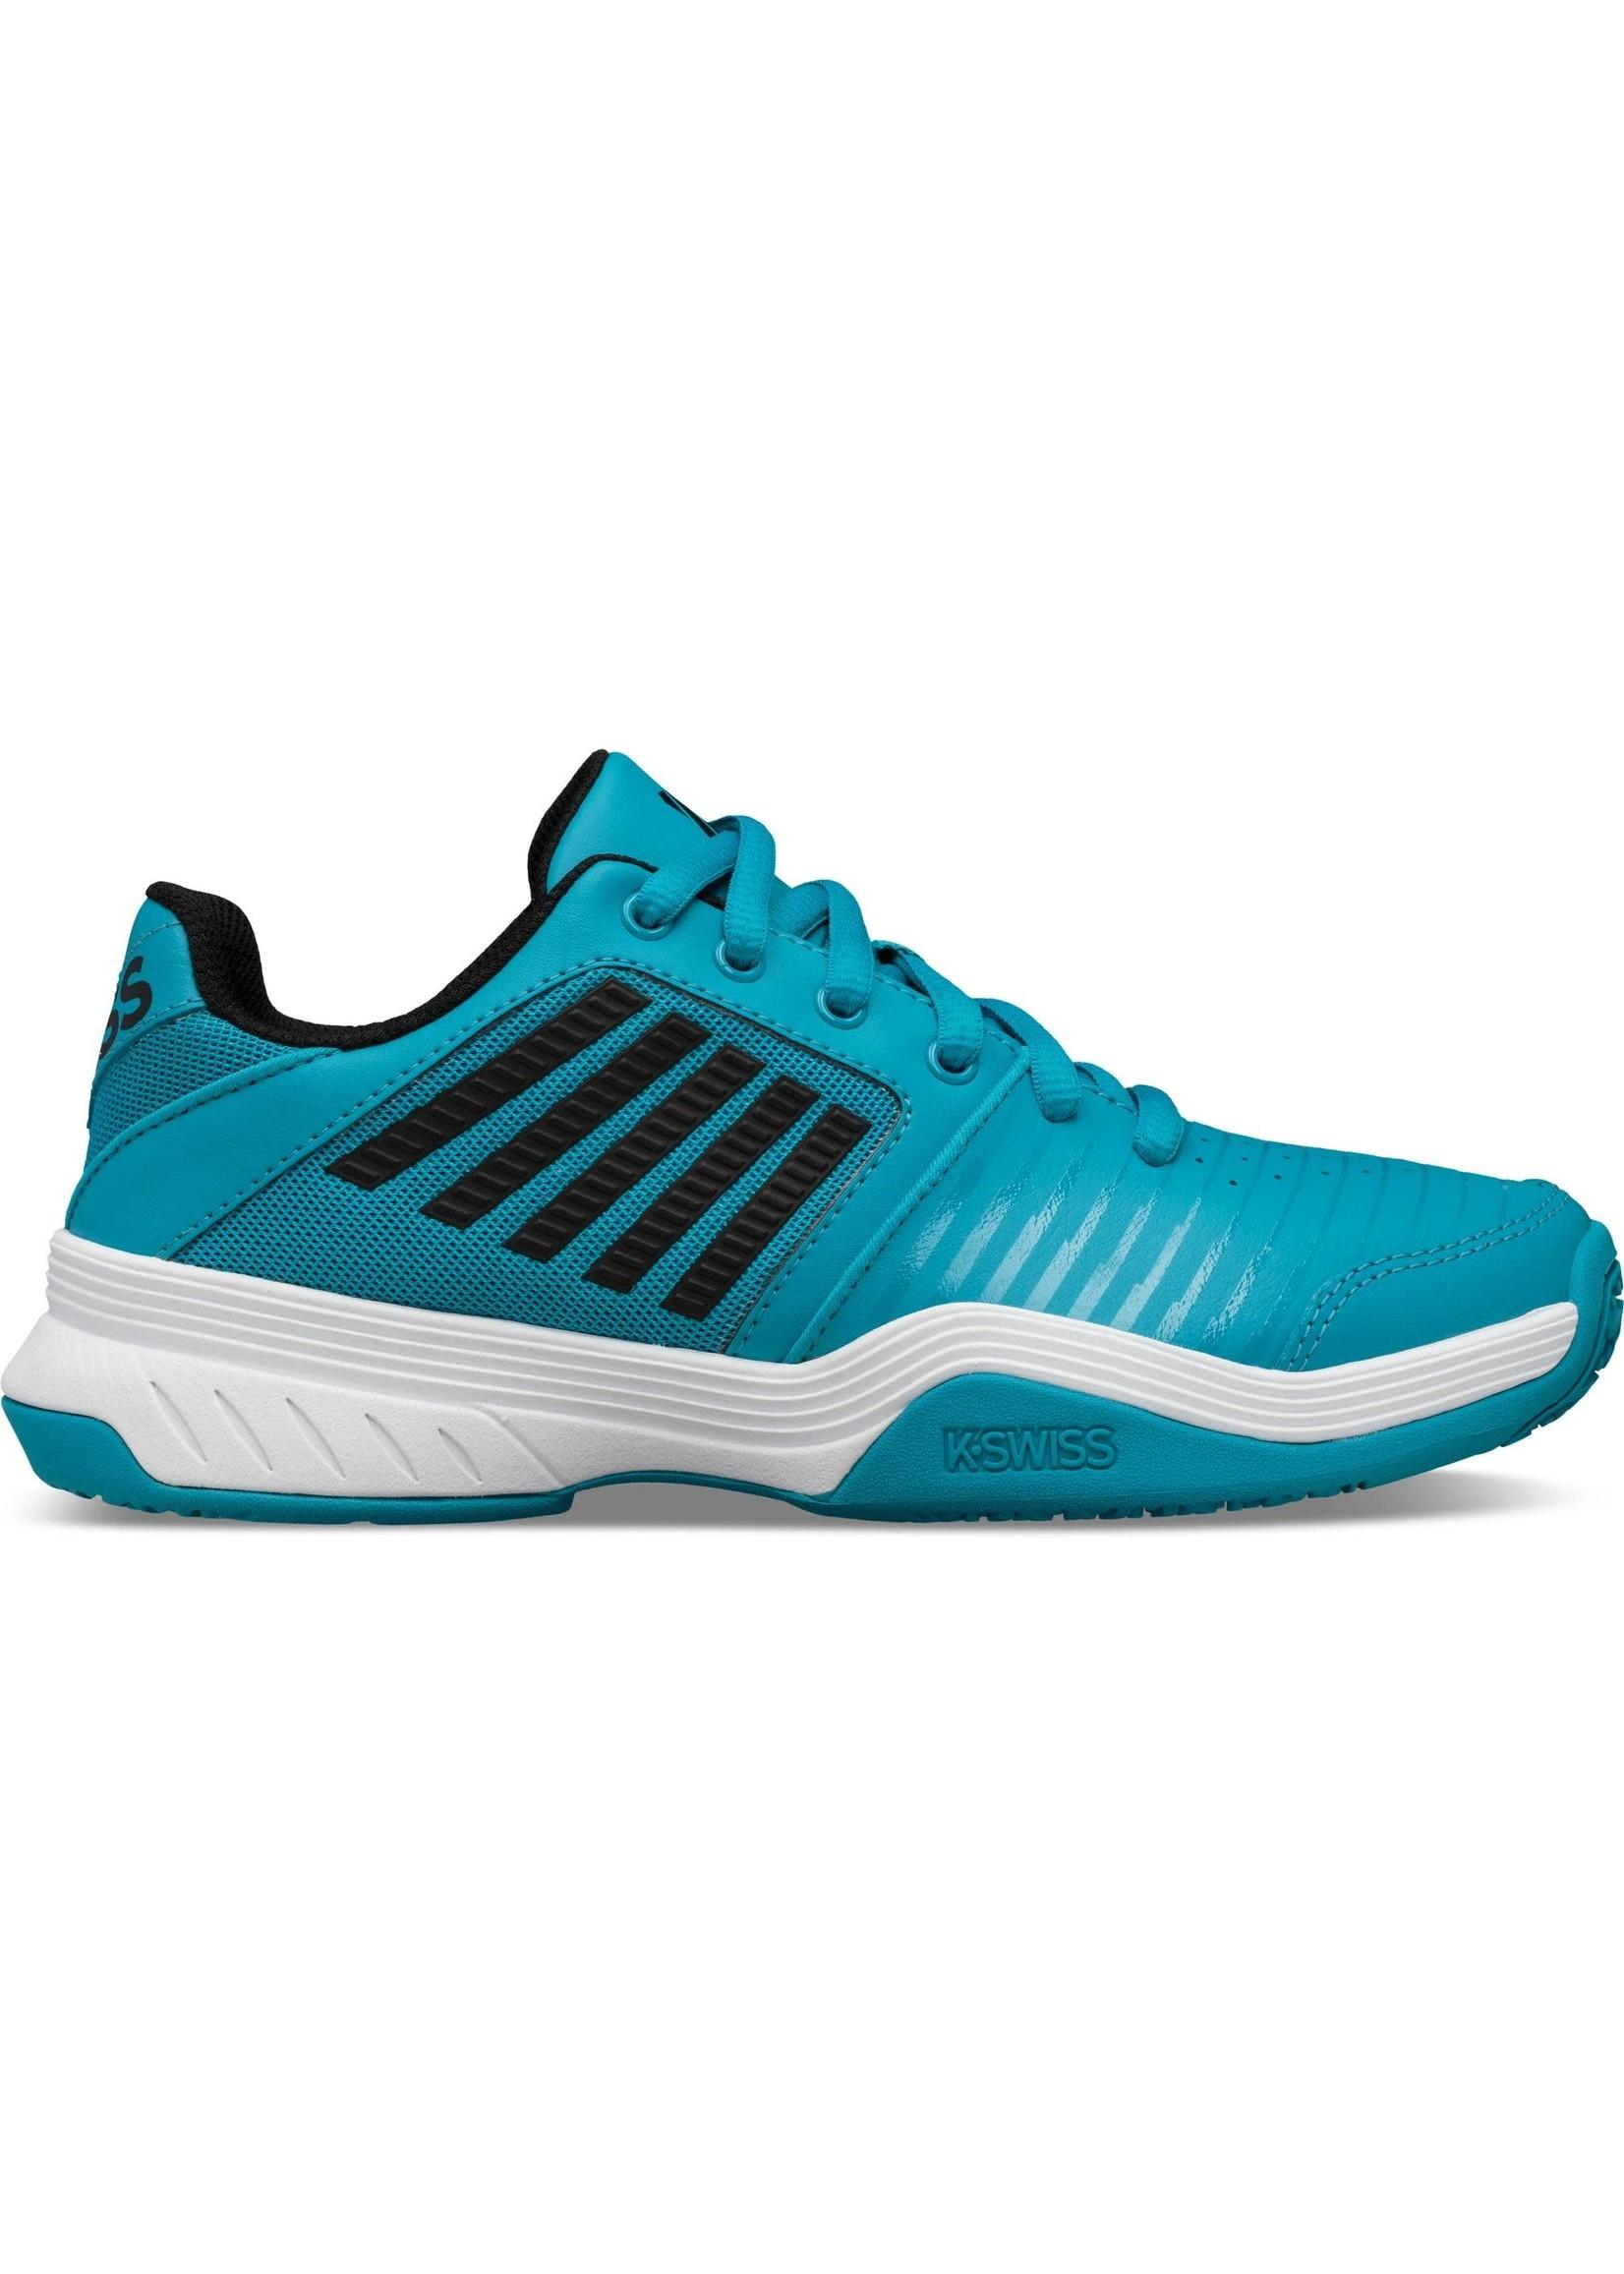 K Swiss K-Swiss Court Express Omni Junior Tennis Shoe (2020)